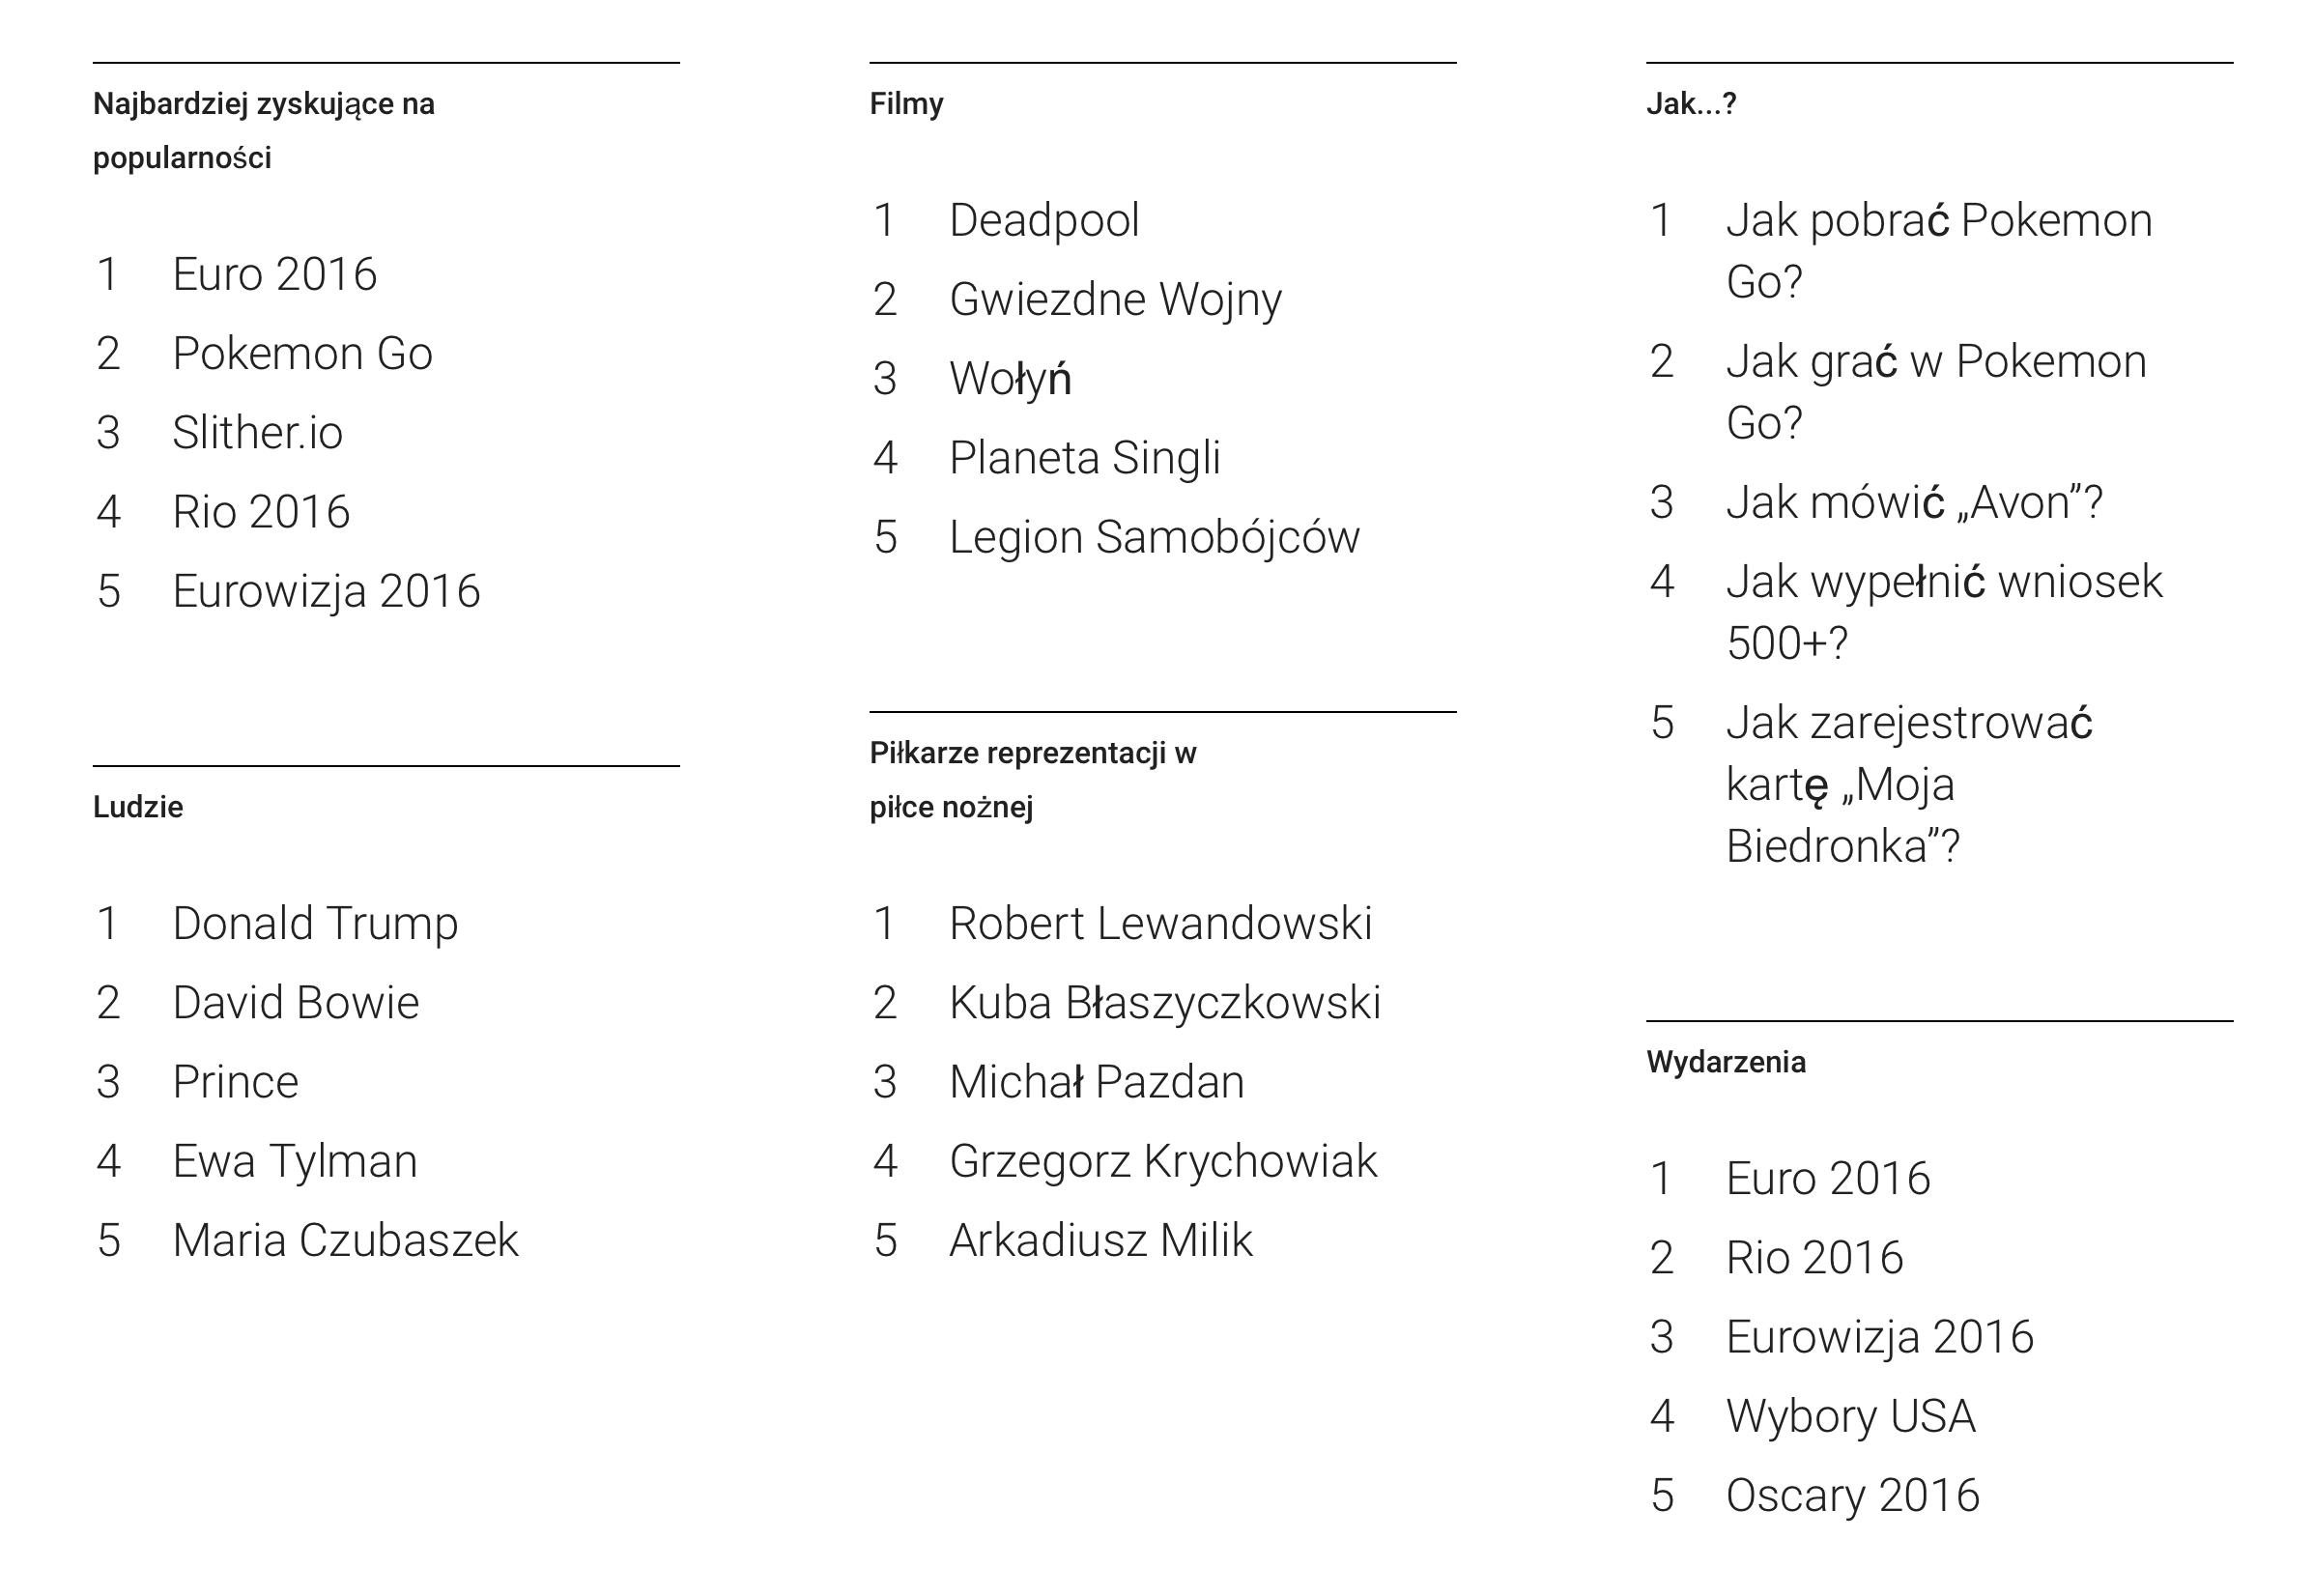 mediarun-slowa-google-polska